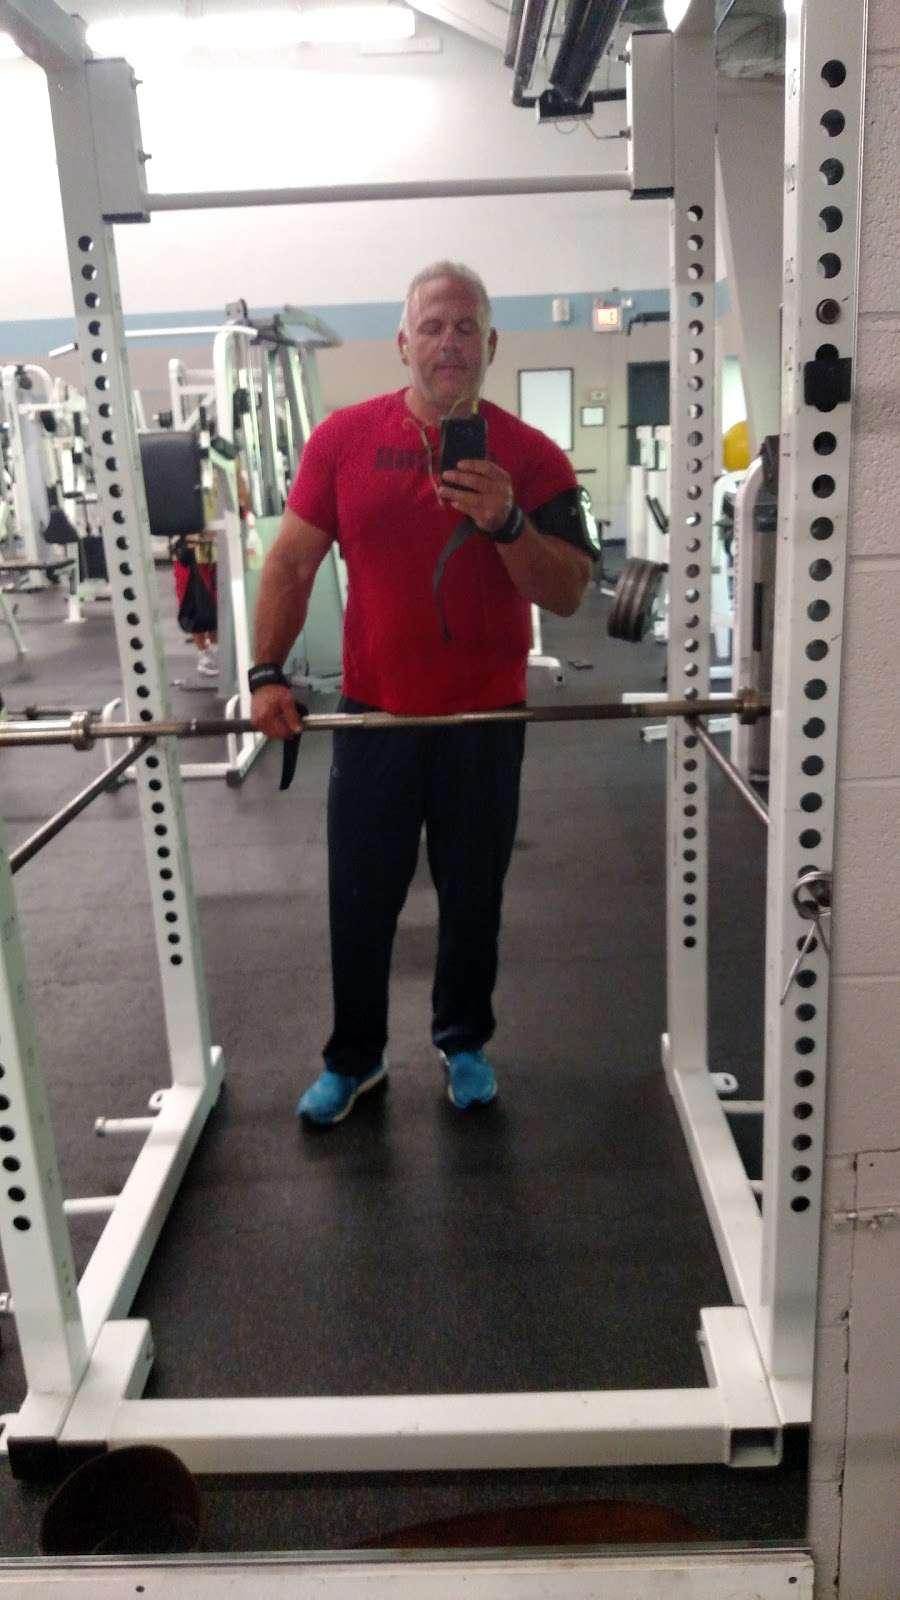 Sparta Athletic Club - gym    Photo 2 of 5   Address: 115 S Sparta Ave, Sparta Township, NJ 07871, USA   Phone: (973) 729-9141